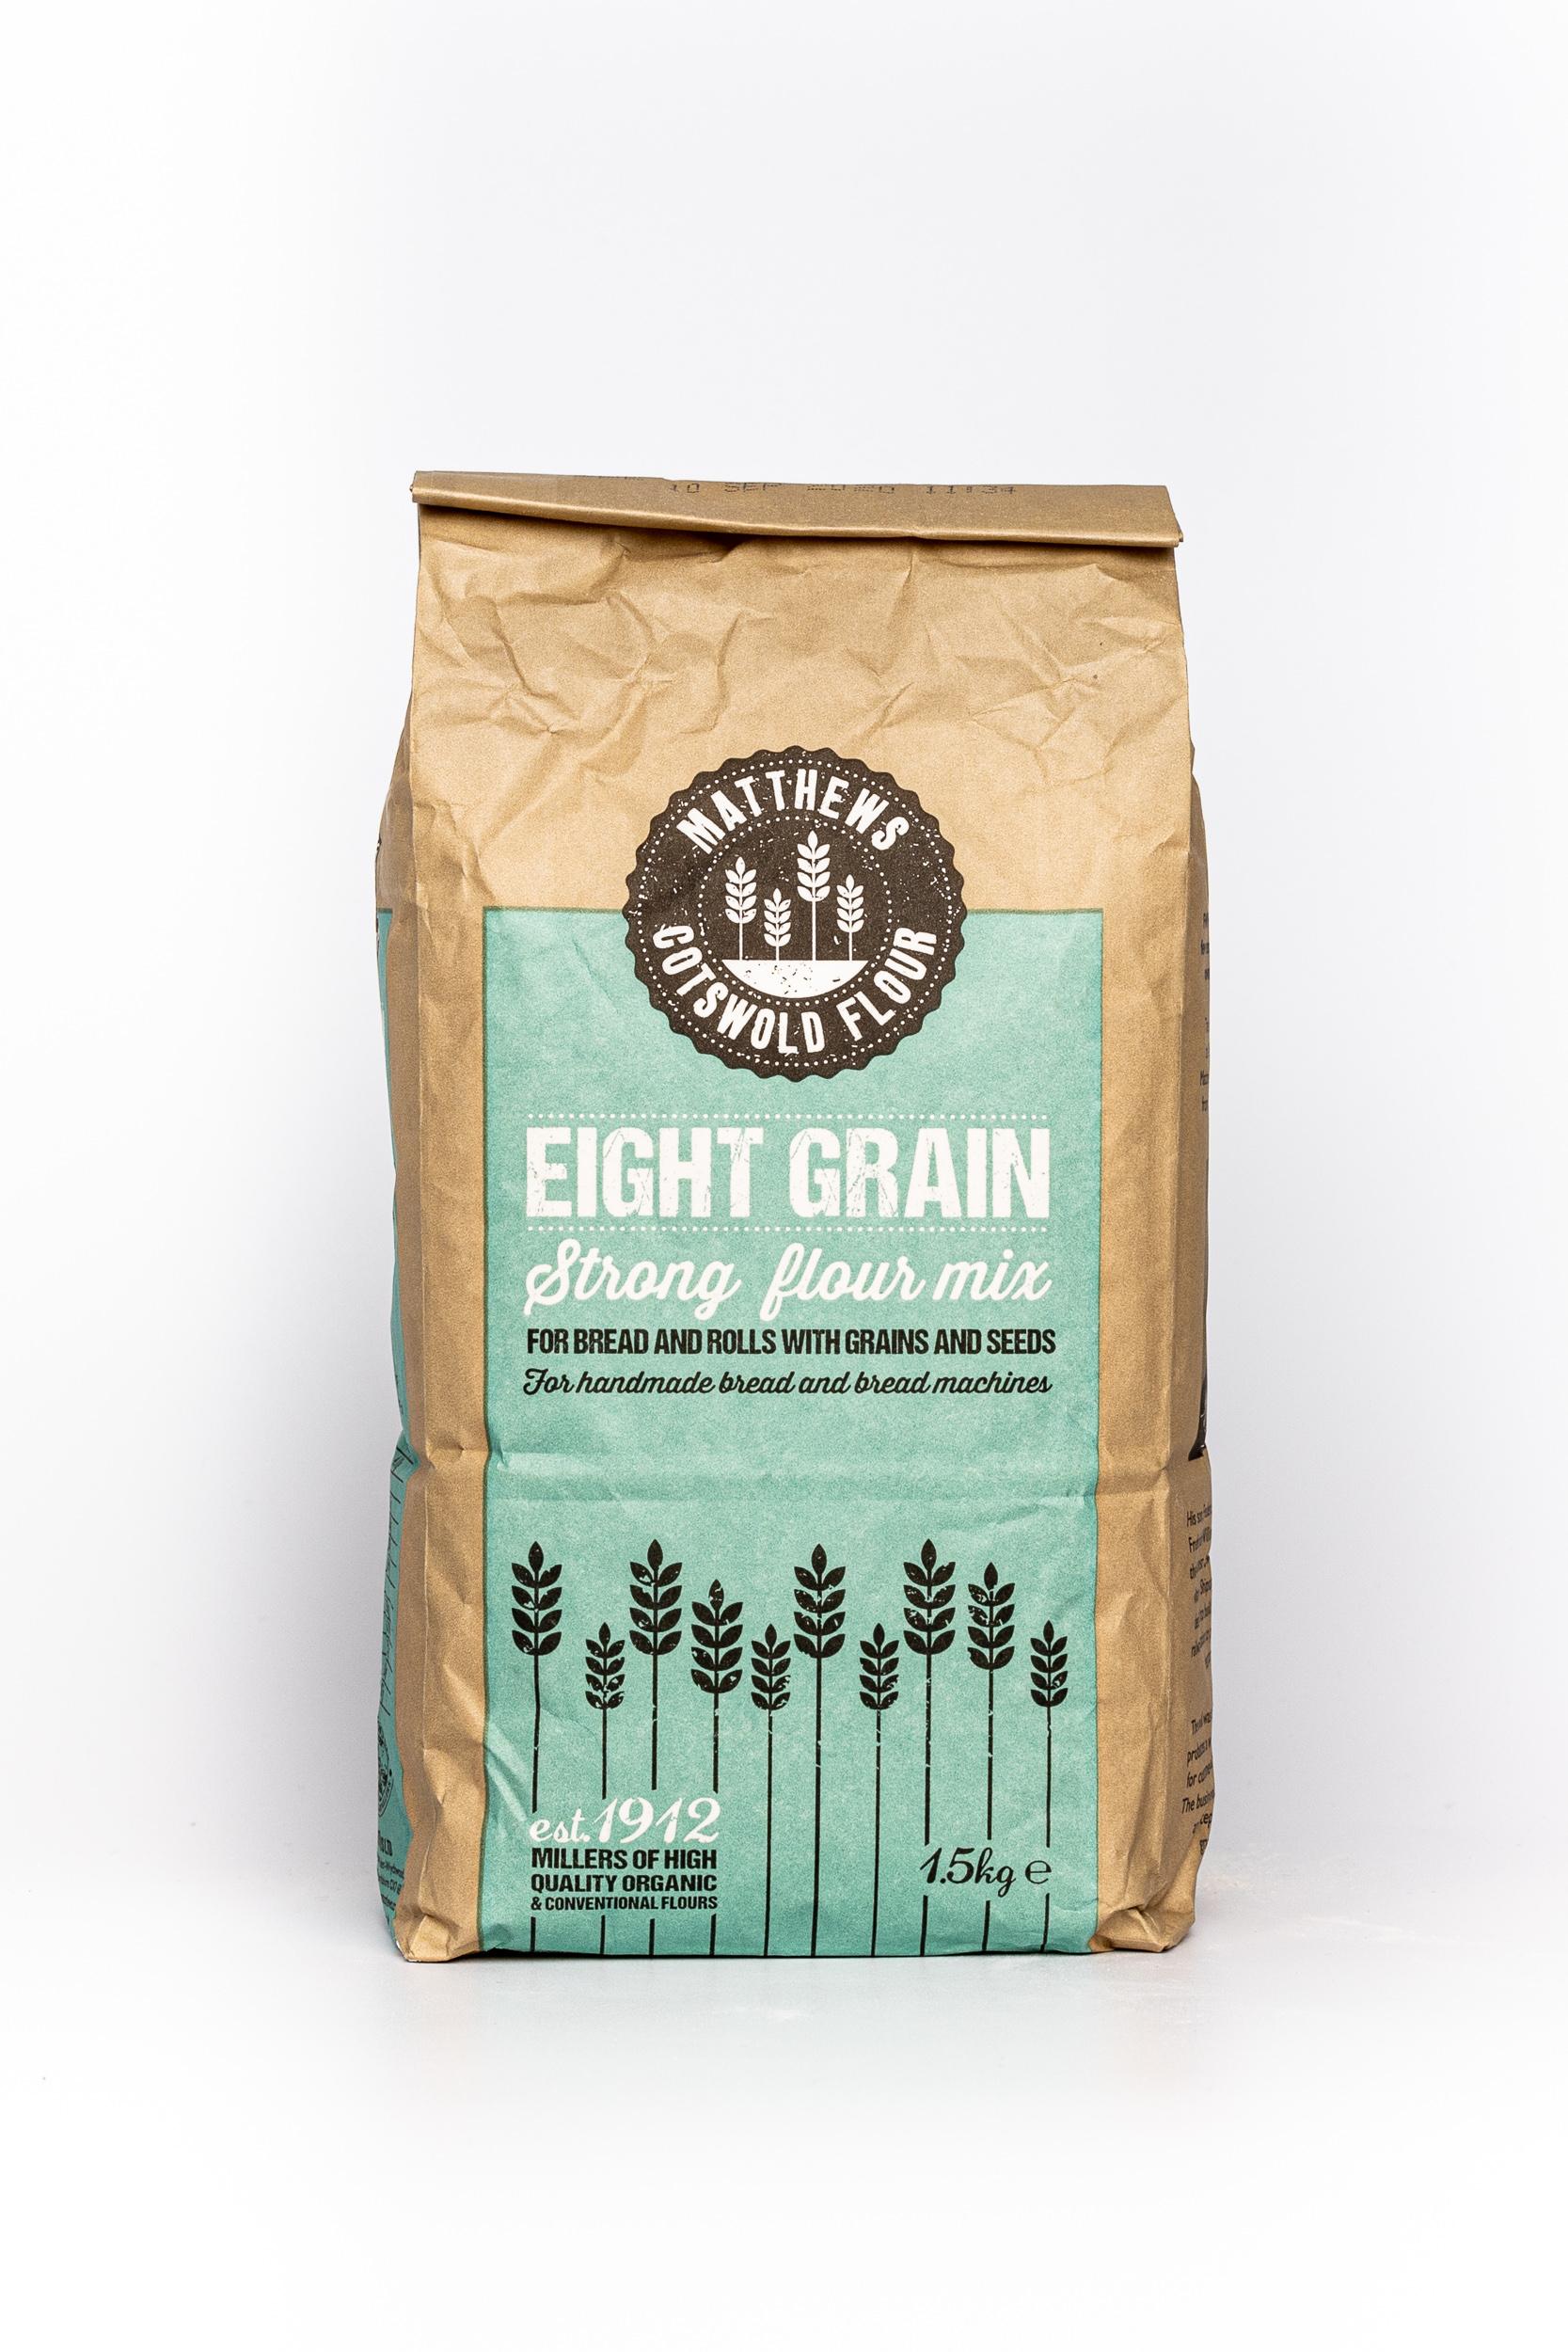 Eight Grain front